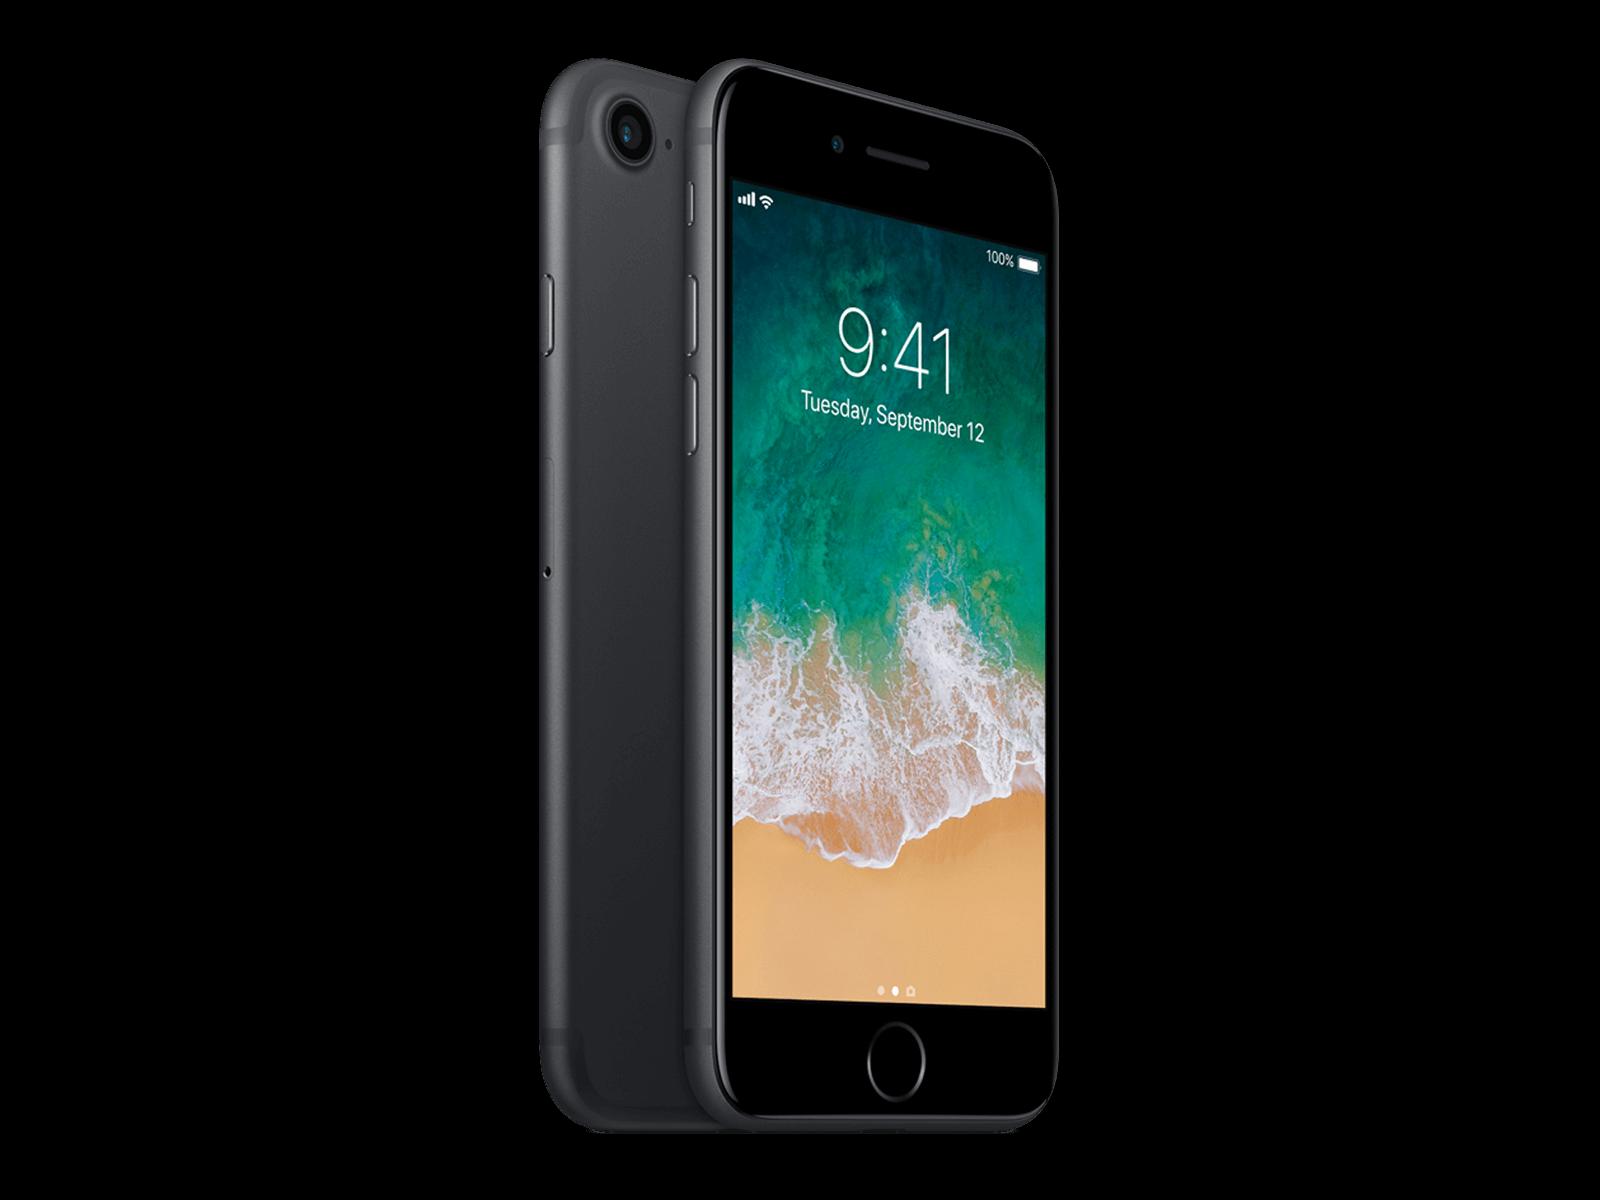 Rask Køb iPhone 7 128GB Black Uden abonnement |  Humac Premium Reseller XI-41